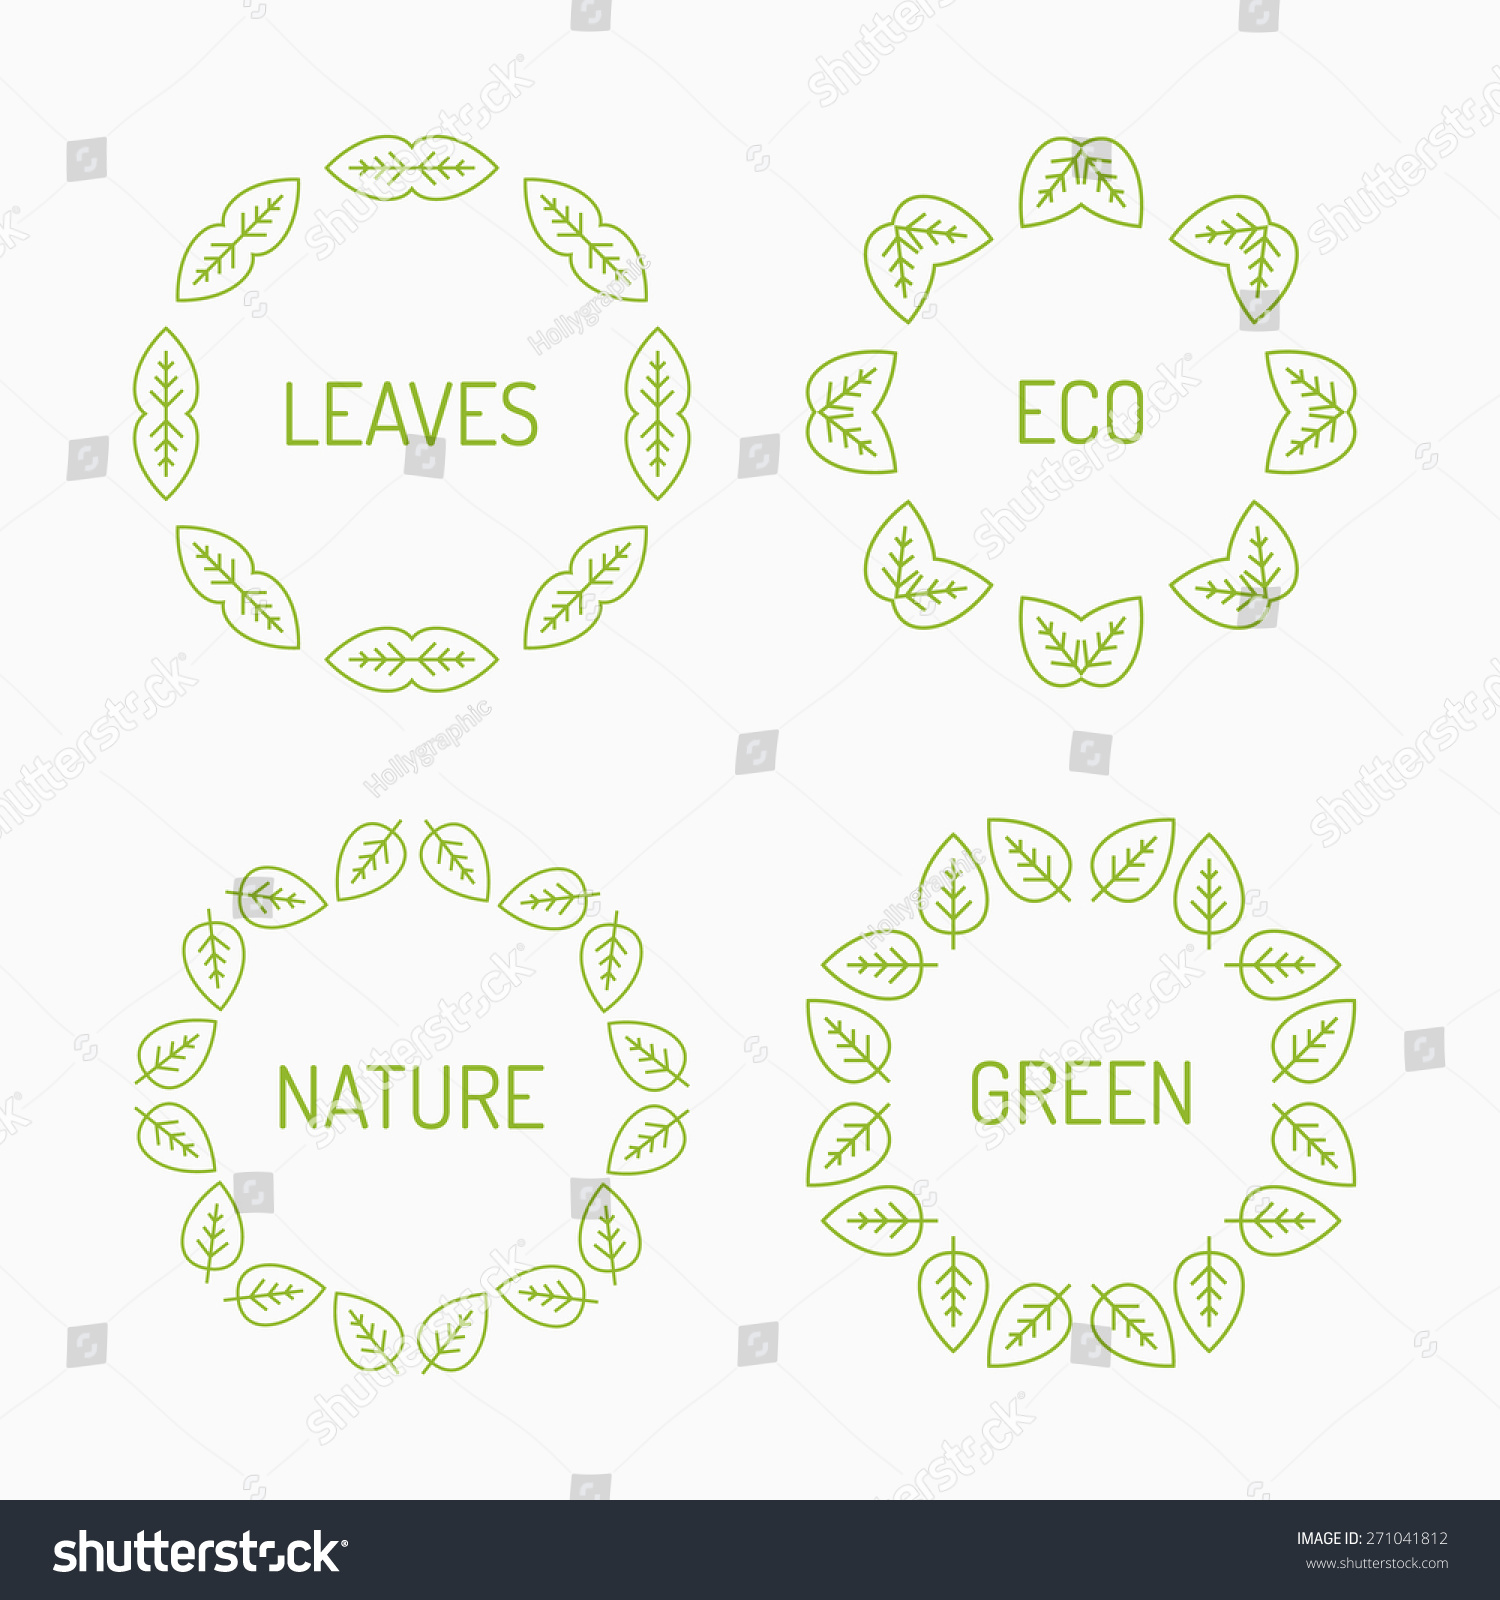 Green Leaves Eco Frames Graphic Stock Vector 271041812 - Shutterstock